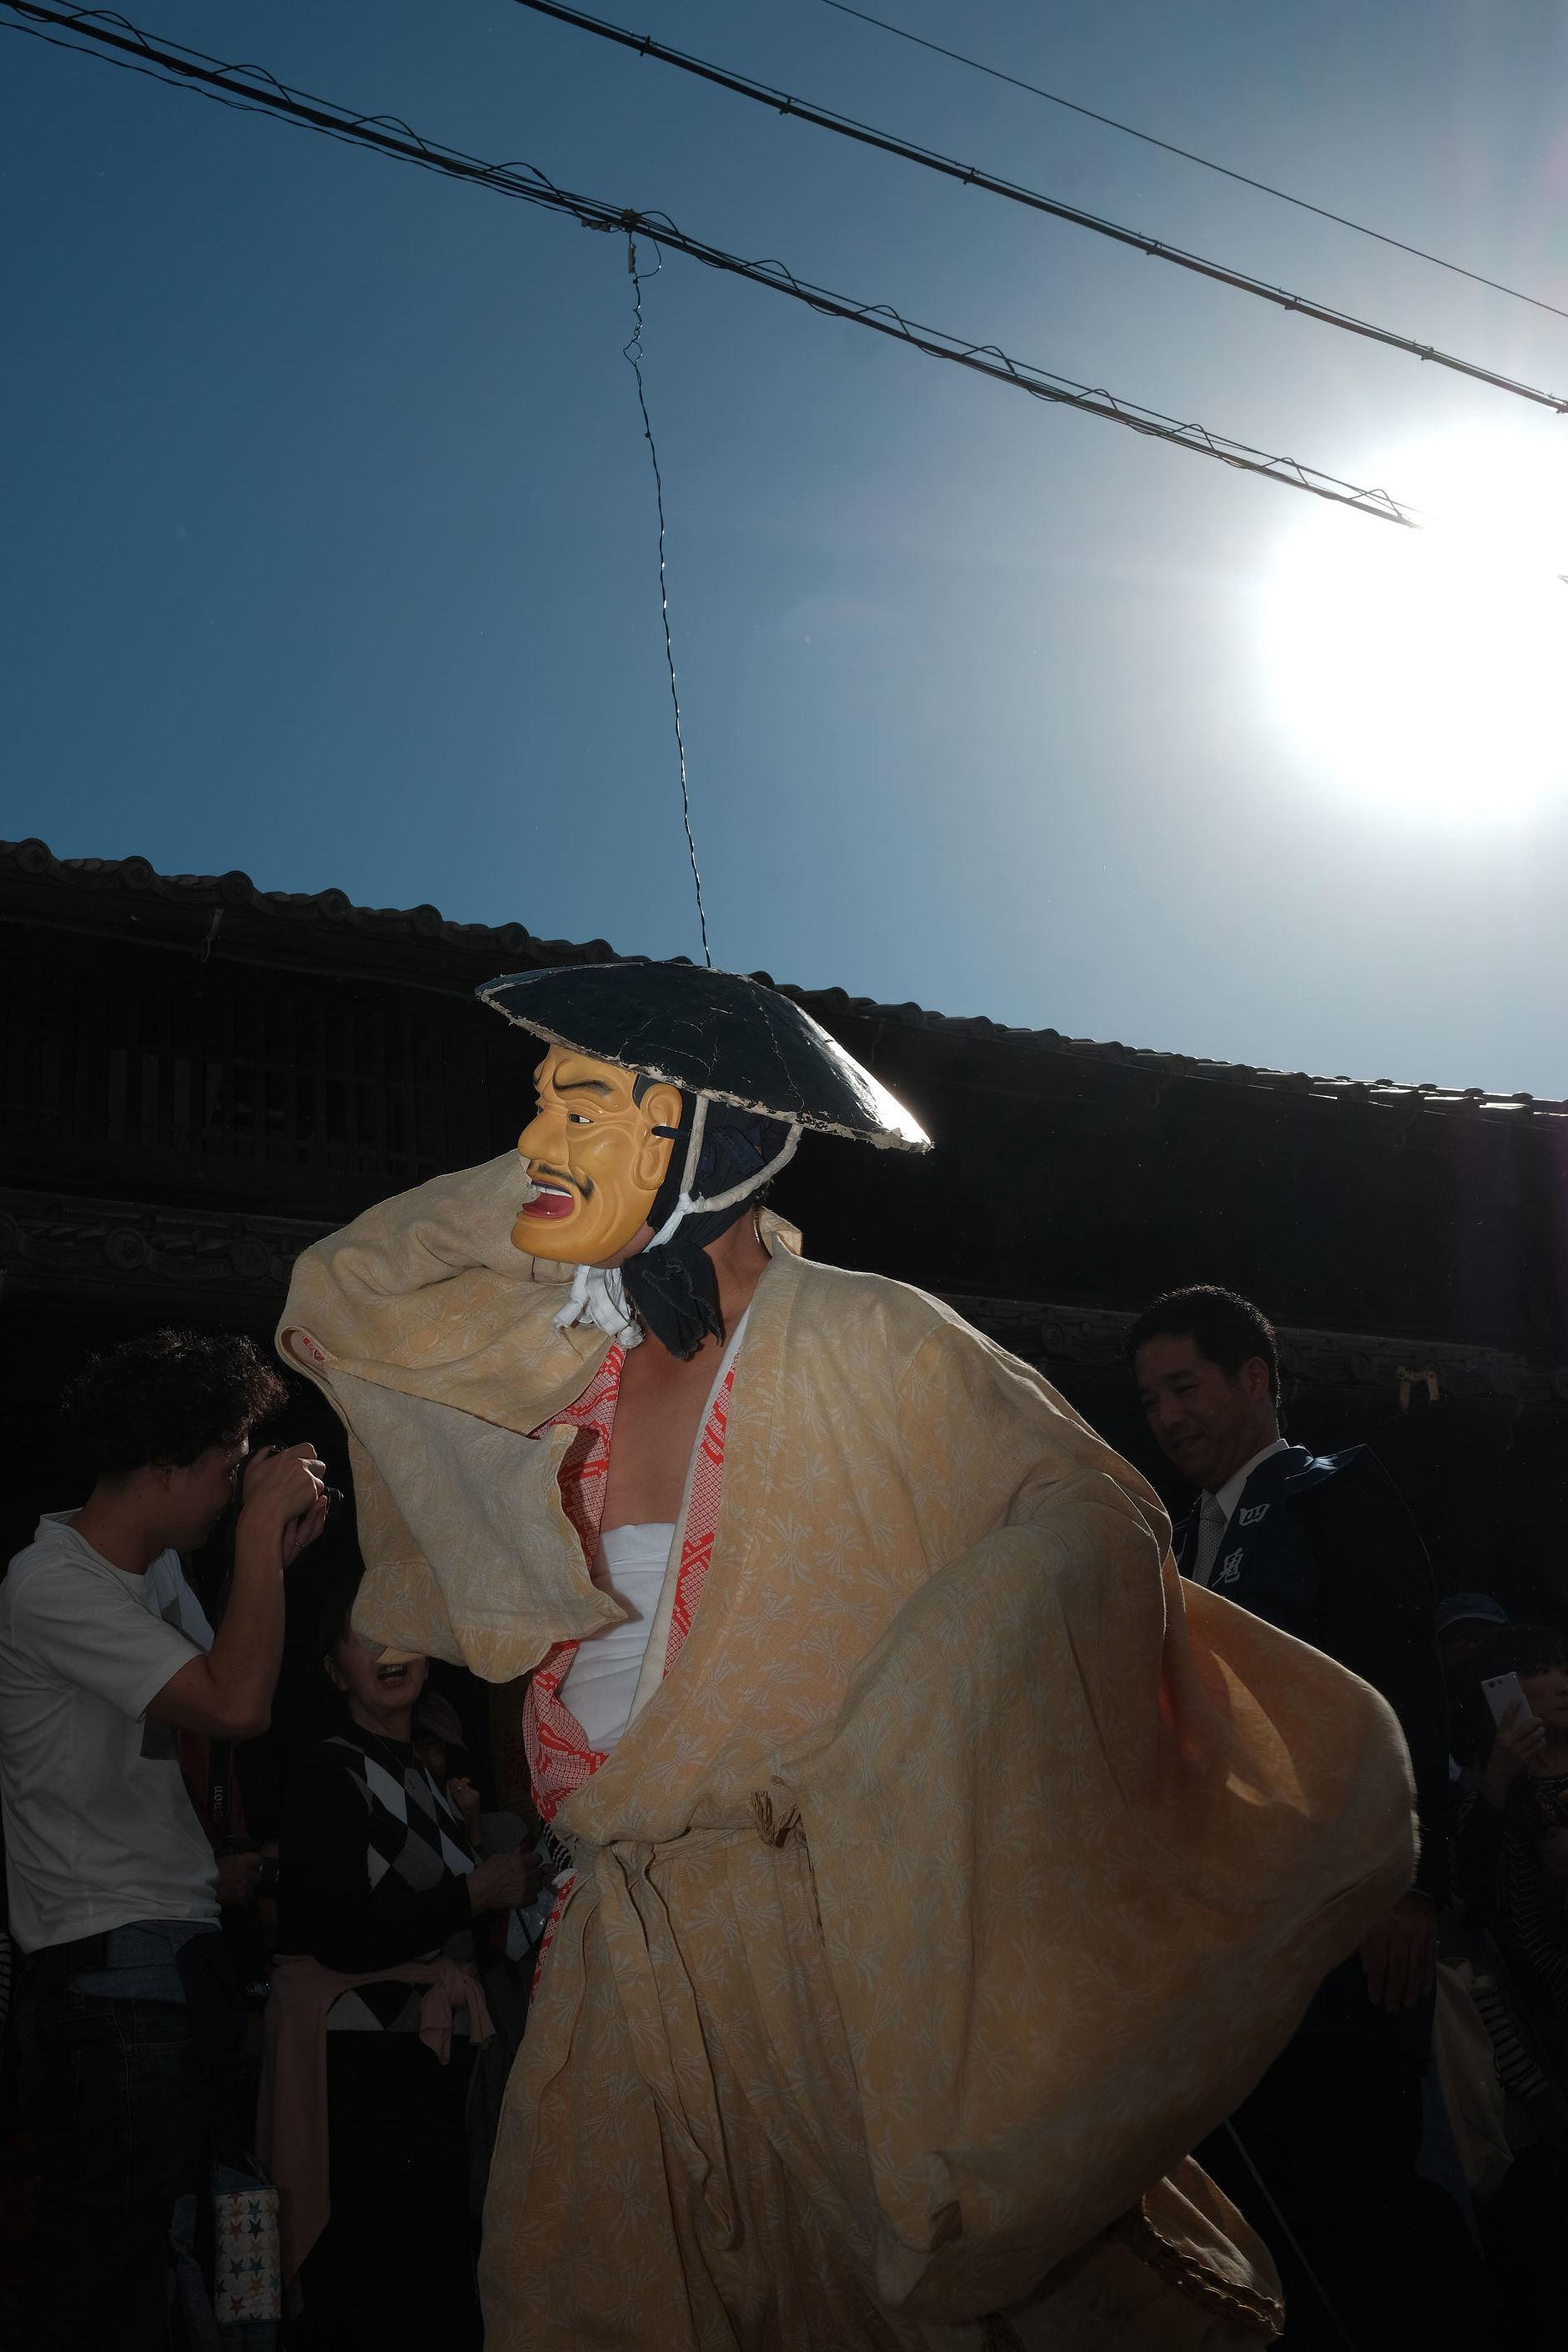 上野天神祭り_f0021869_20553029.jpg